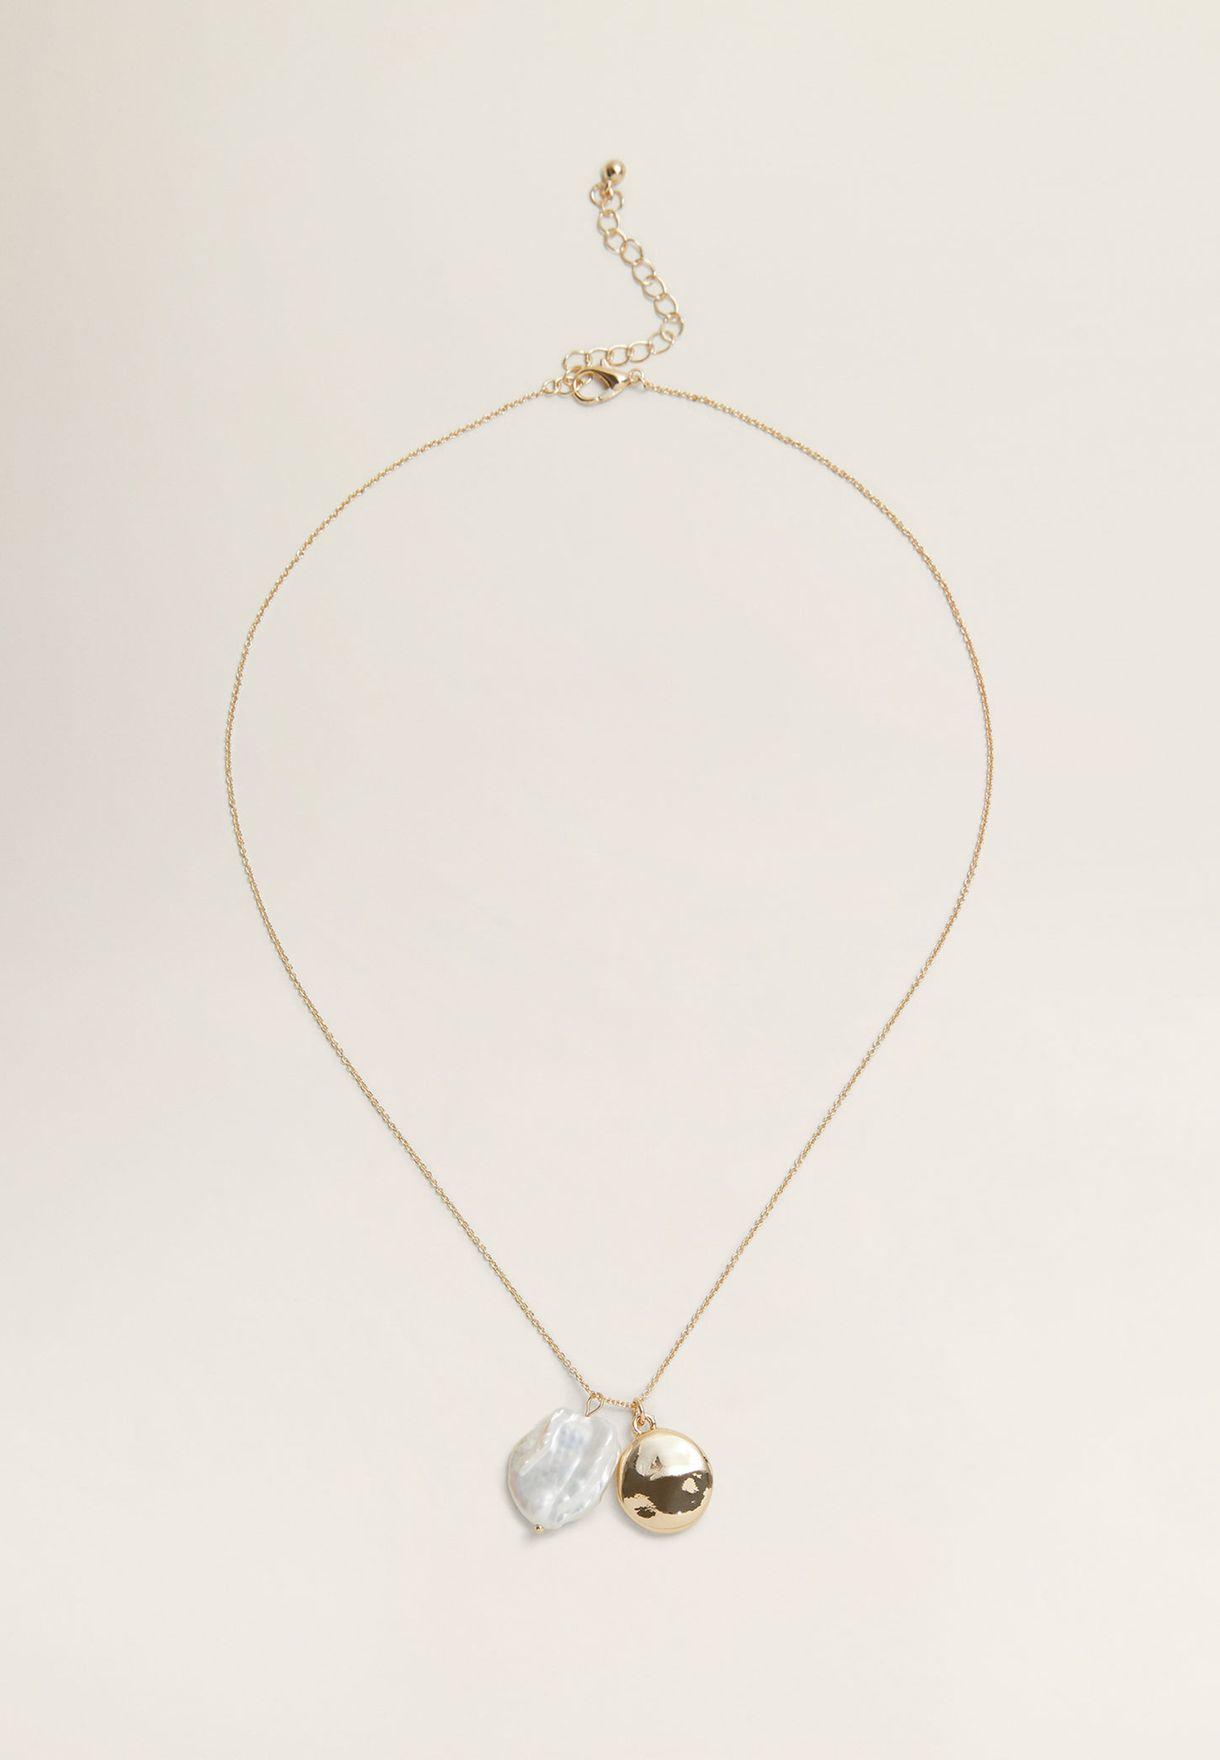 Peony Layered Necklace